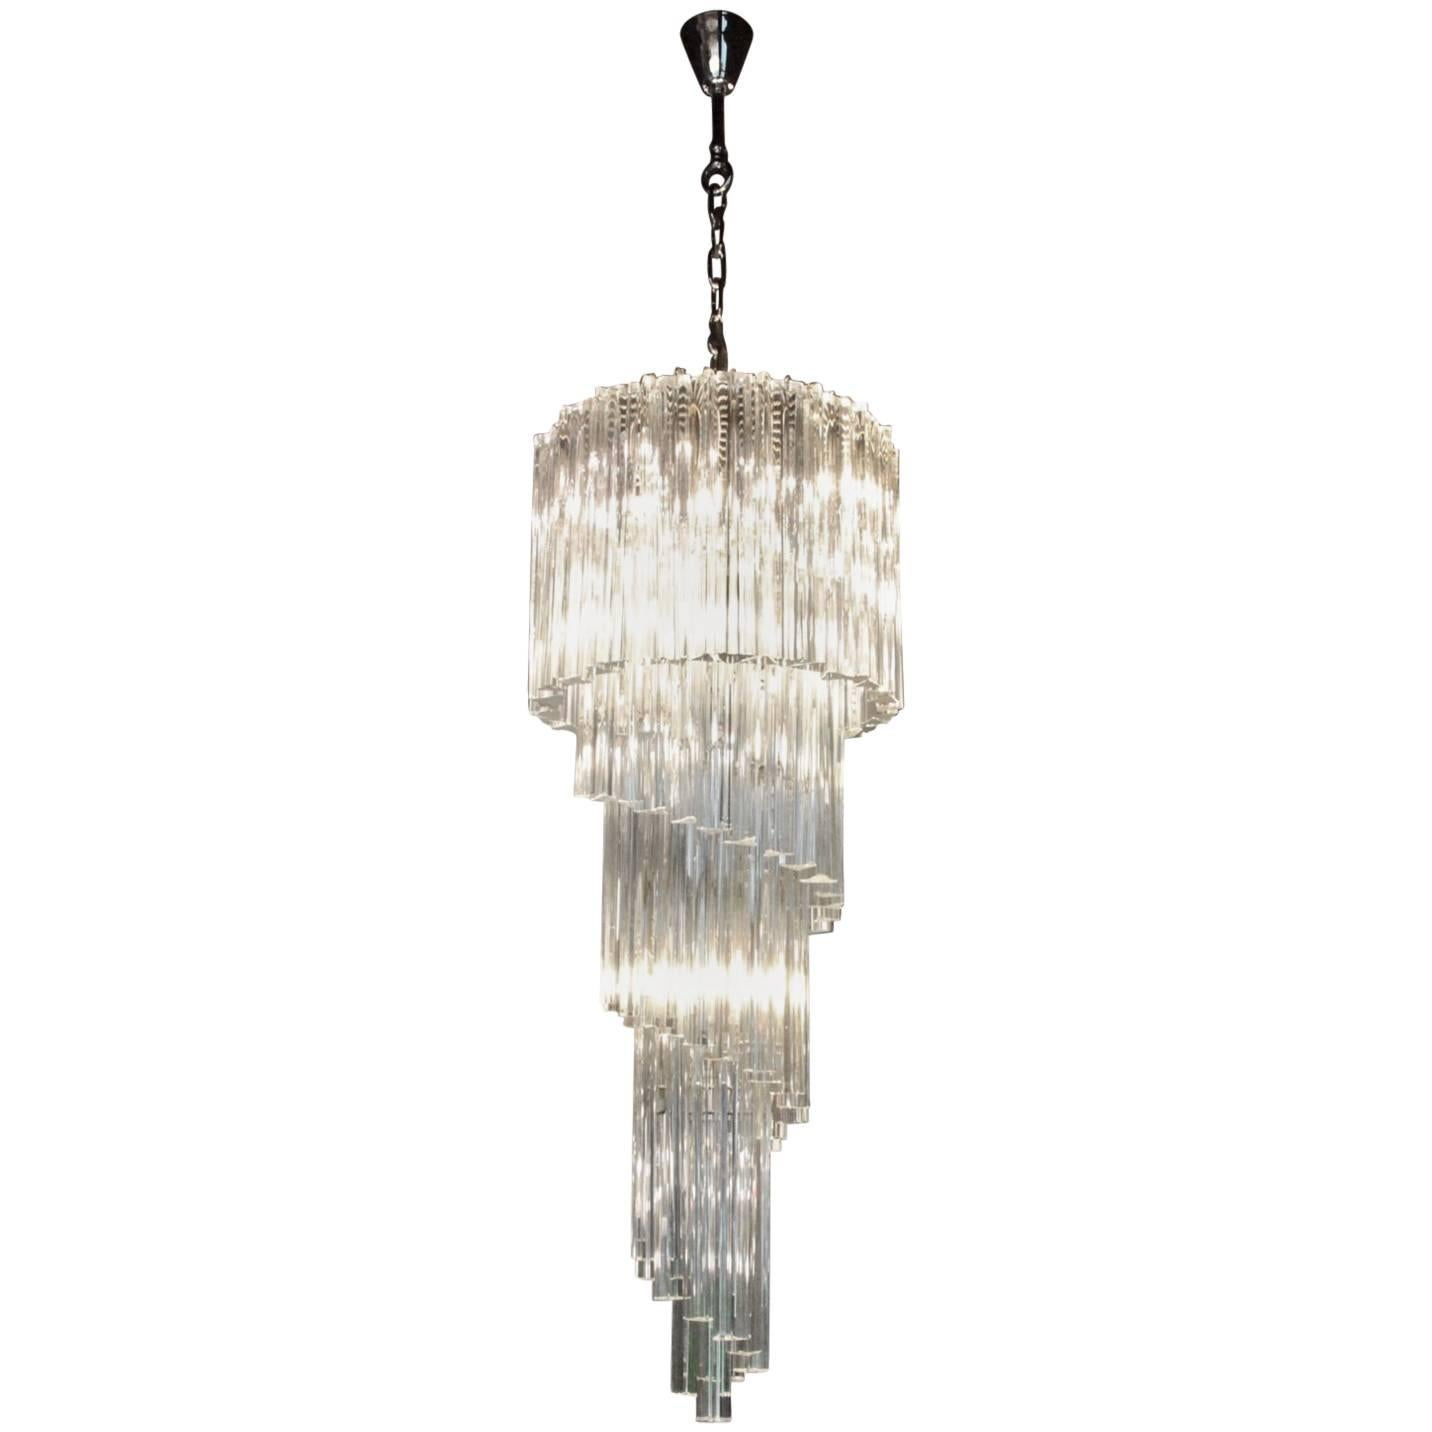 Murano Glass Spiral Chandelier by Venini